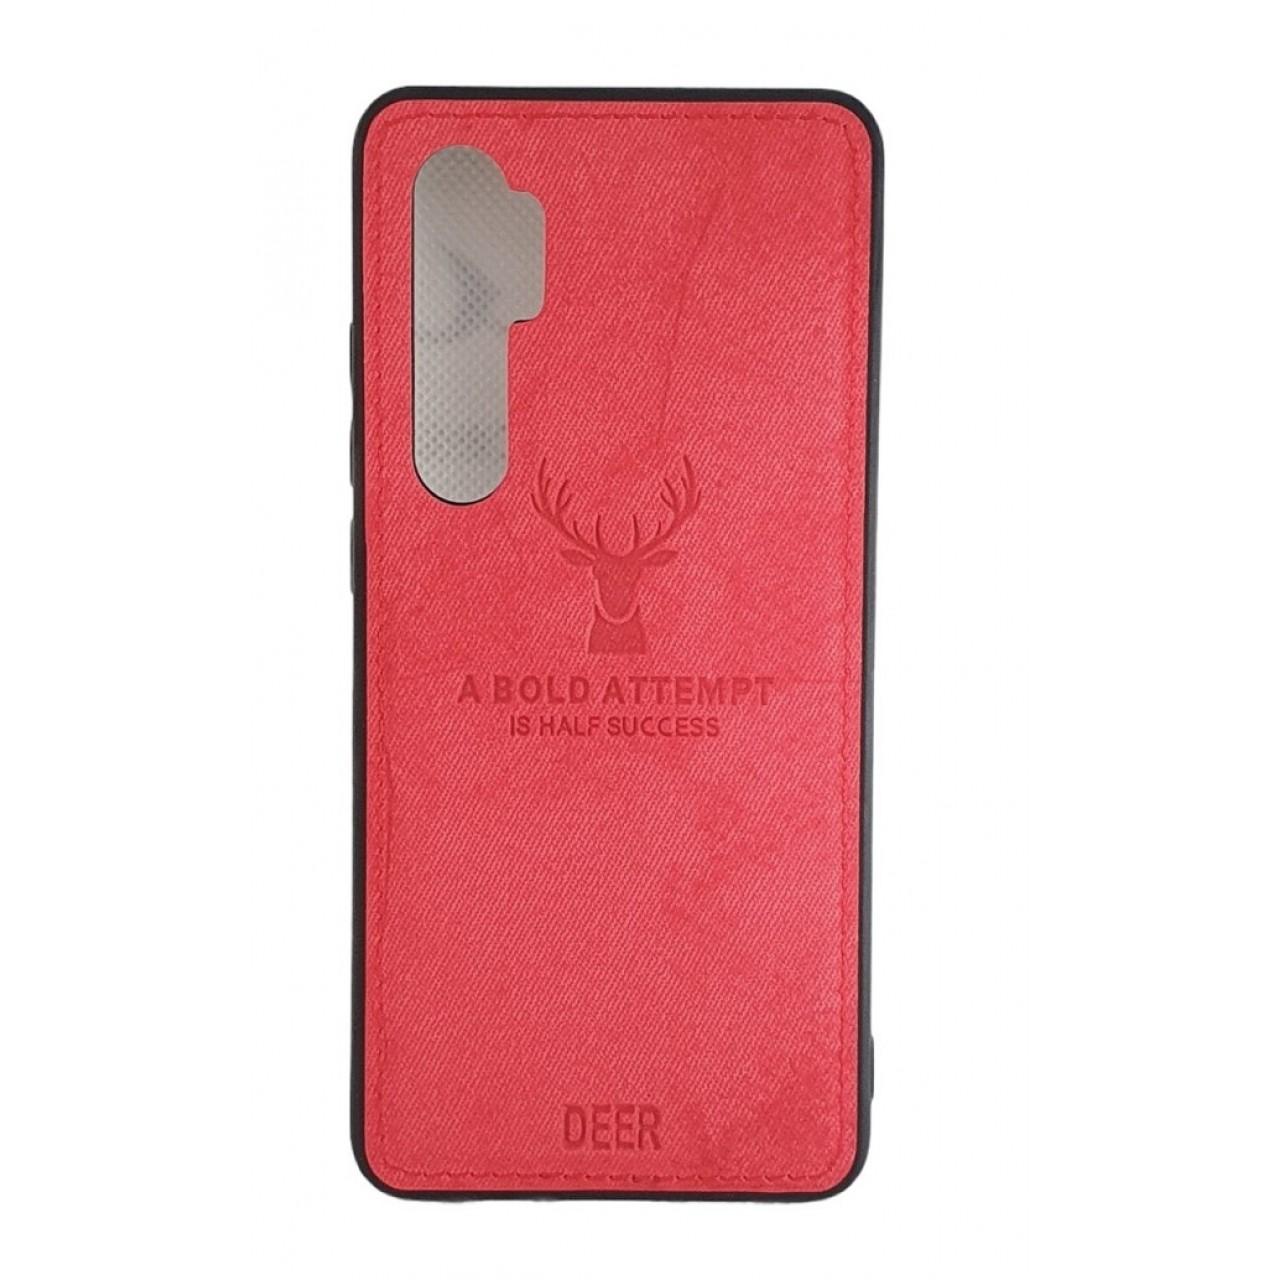 DEER CLOTH BACK CASE FOR XIAOMI Mi Note 10 Lite - RED